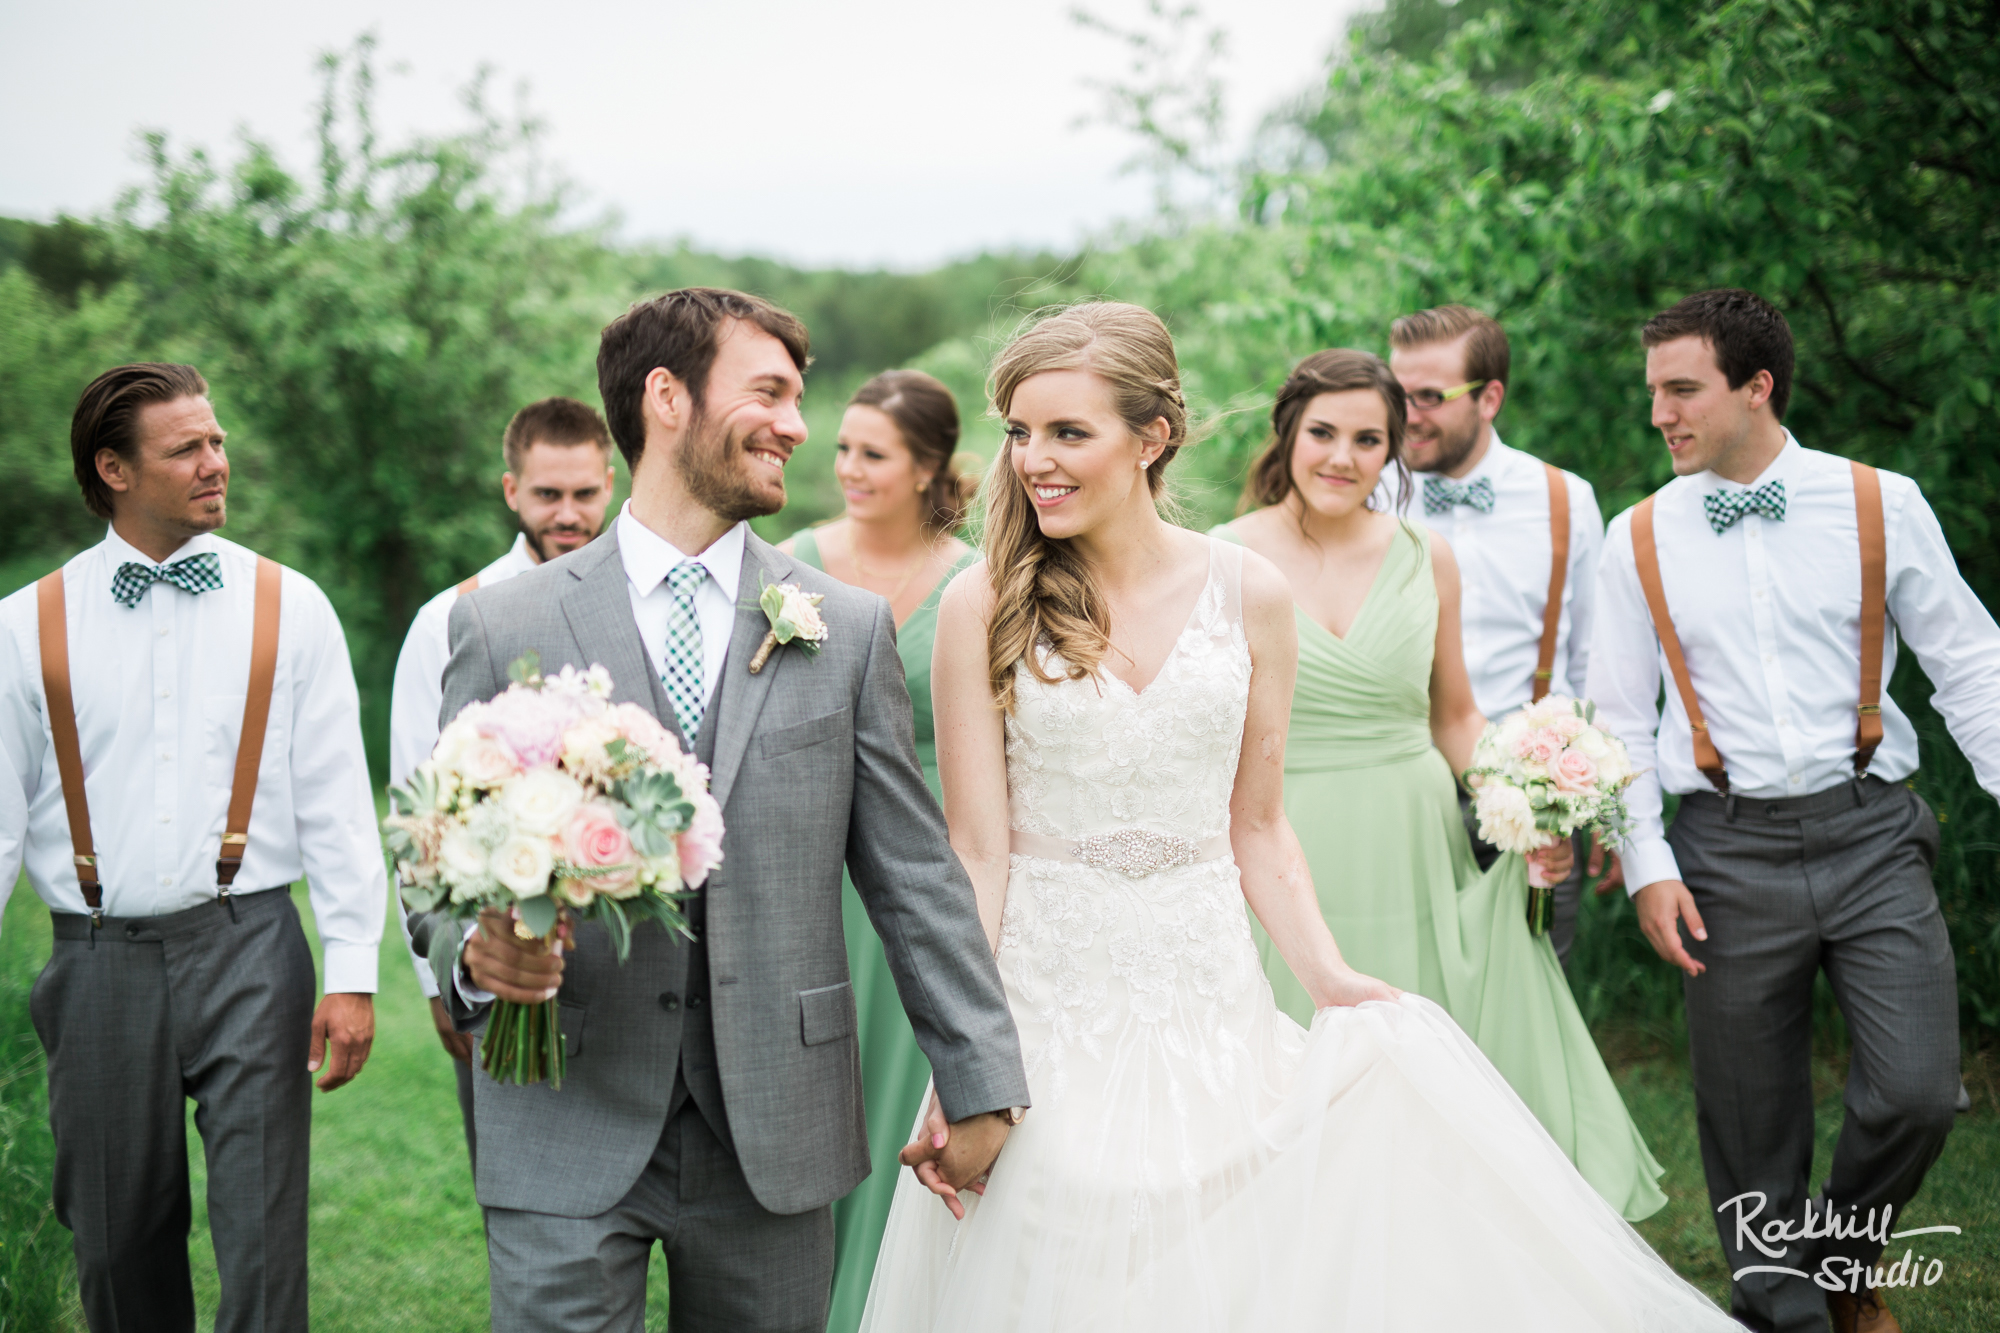 marquette-michigan-wedding-upper-peninsula-spring-photography-rockhill-ee-33.jpg